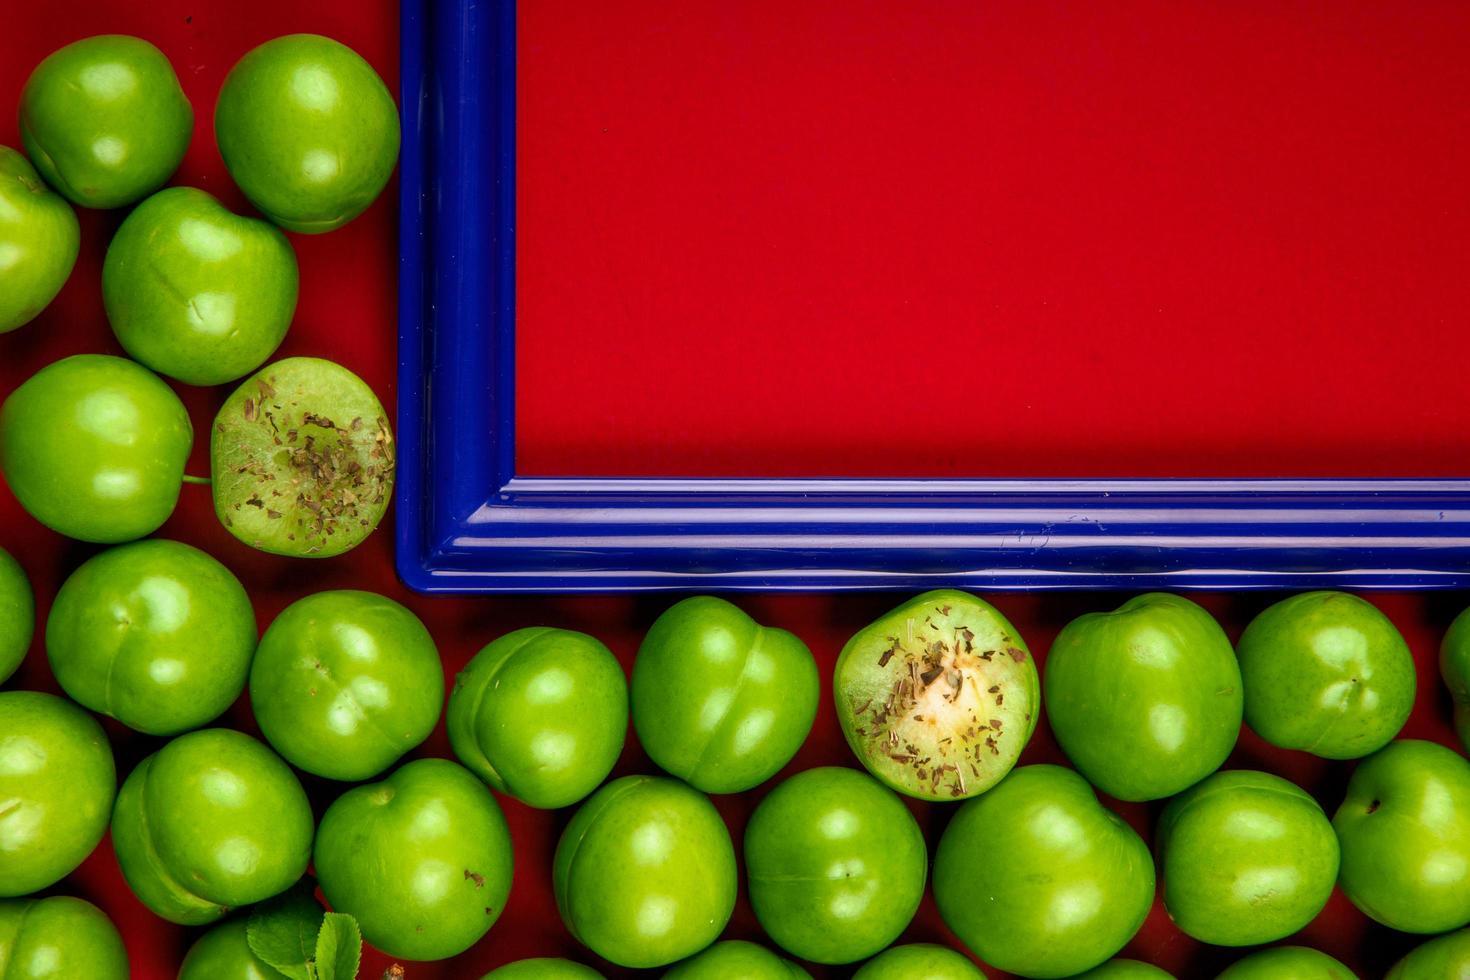 cornice blu con prugne verdi aspre foto